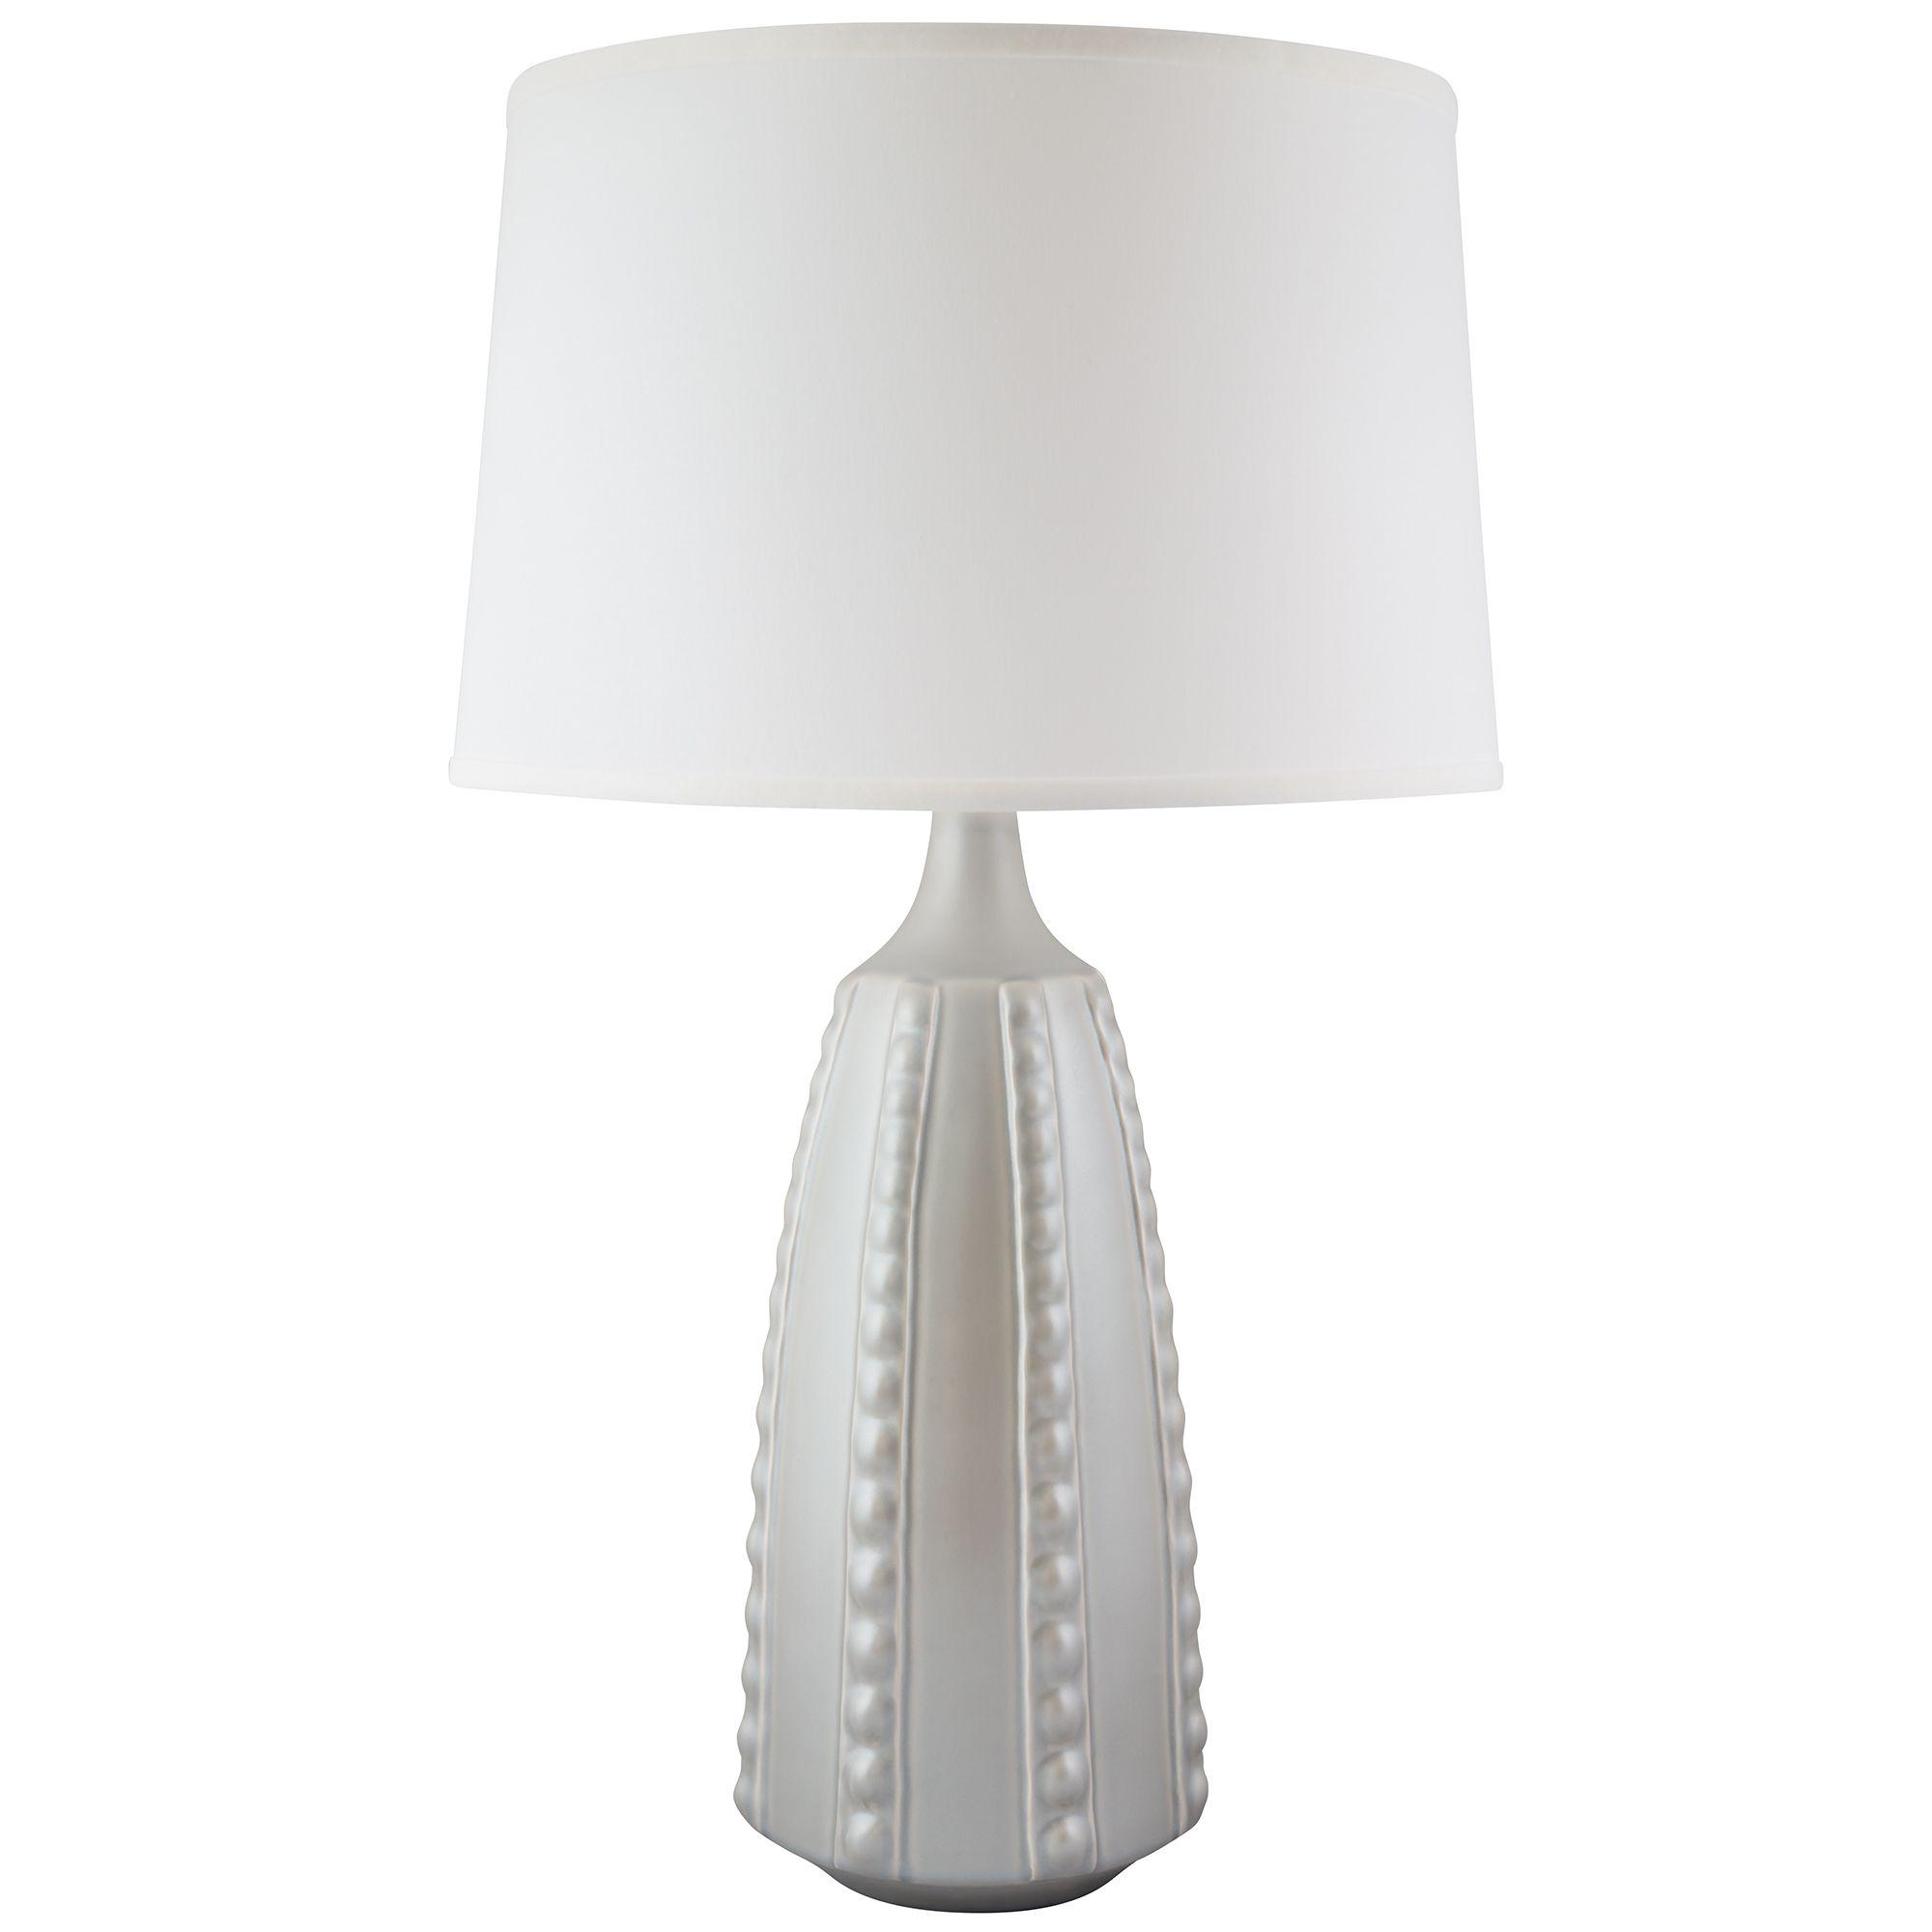 Dotty Lamp By Riverceramic Manufacture Made In Usa Www Riverceramic Com Lamp Table Lamp Home Decor